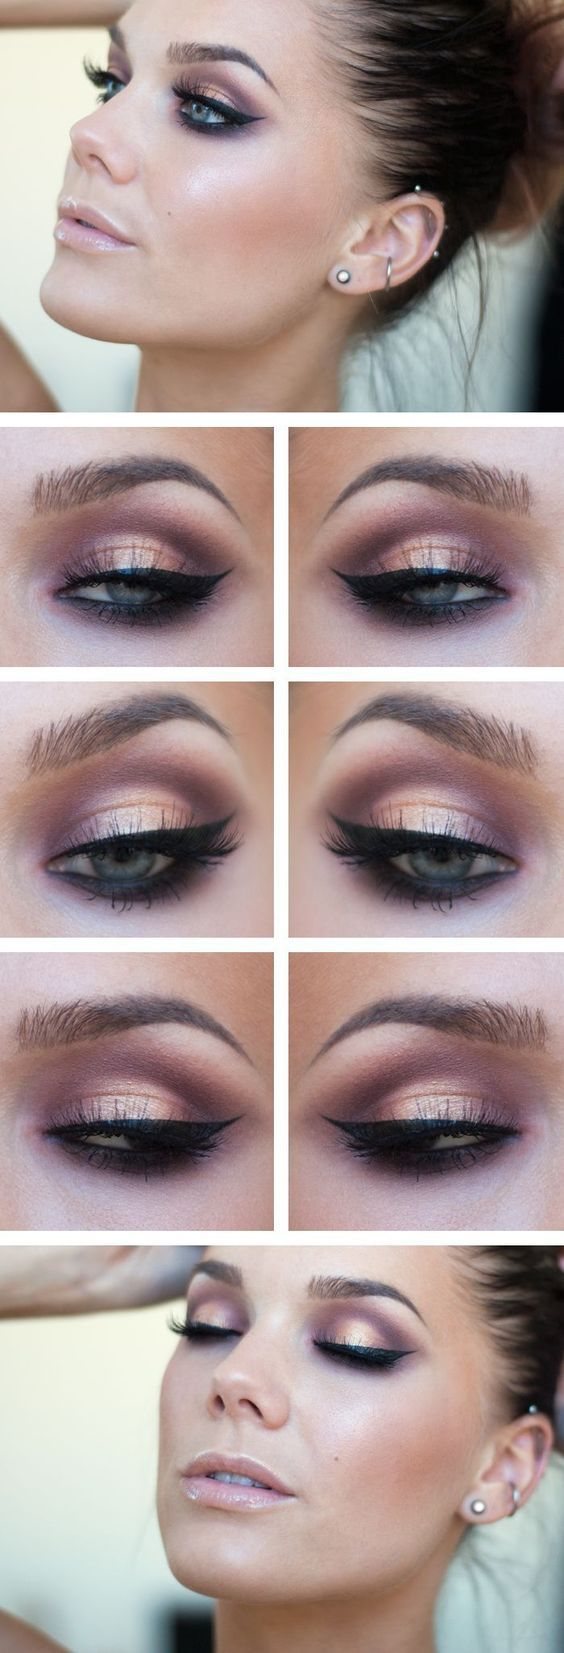 eyes eyemakeup eyedesigns makeup beauty popular